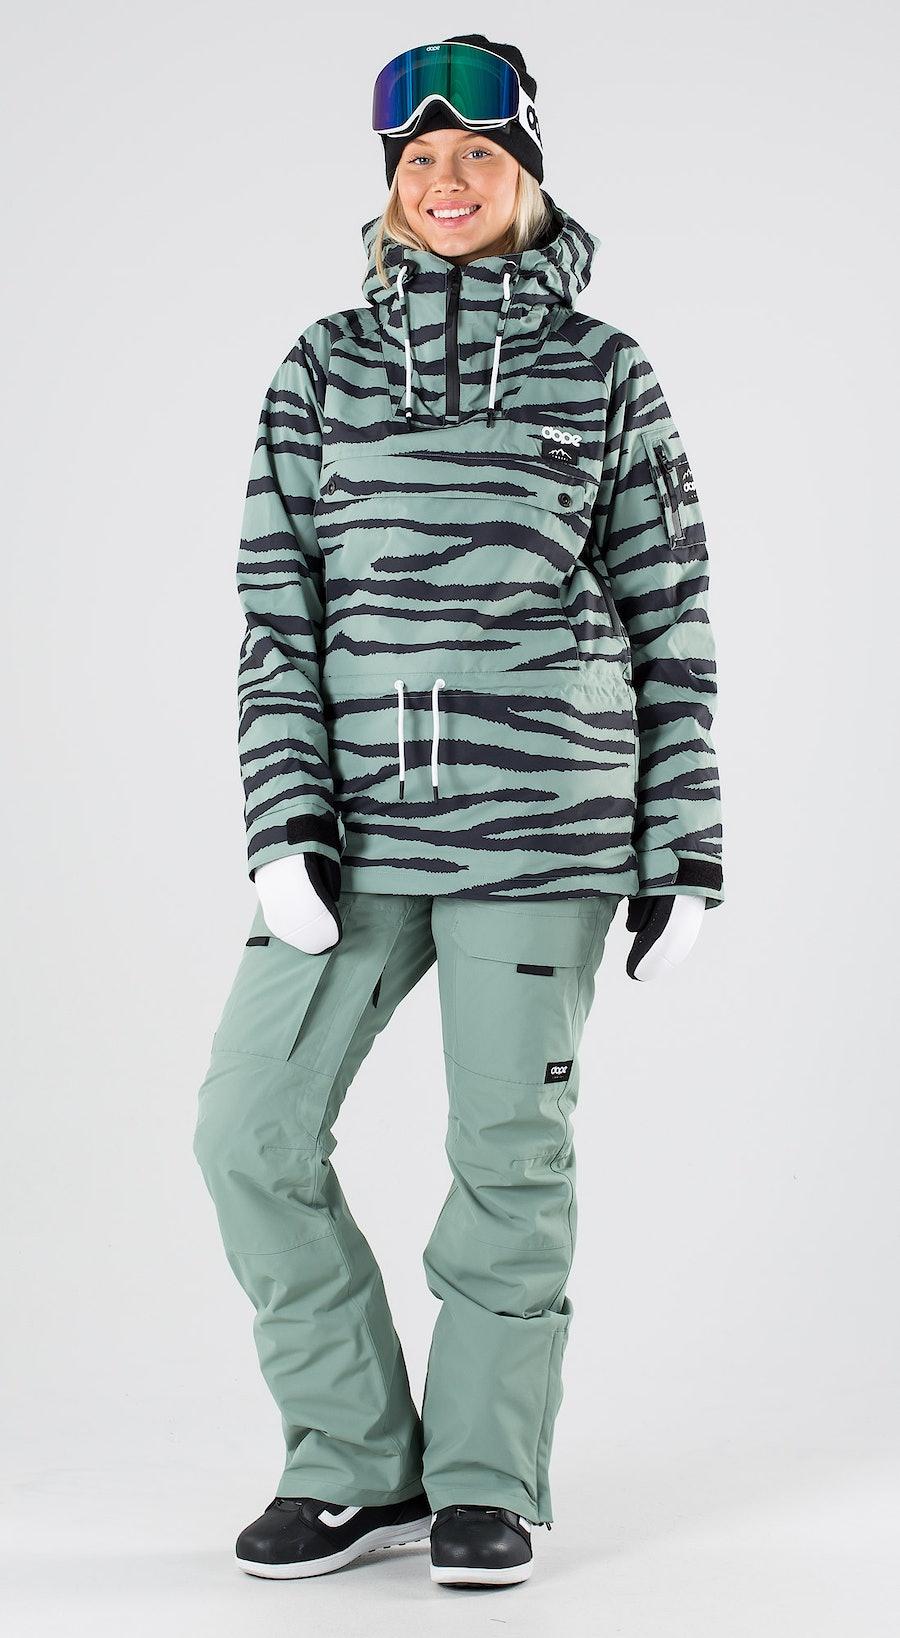 Dope Annok W Green Zebra Snowboard clothing Multi